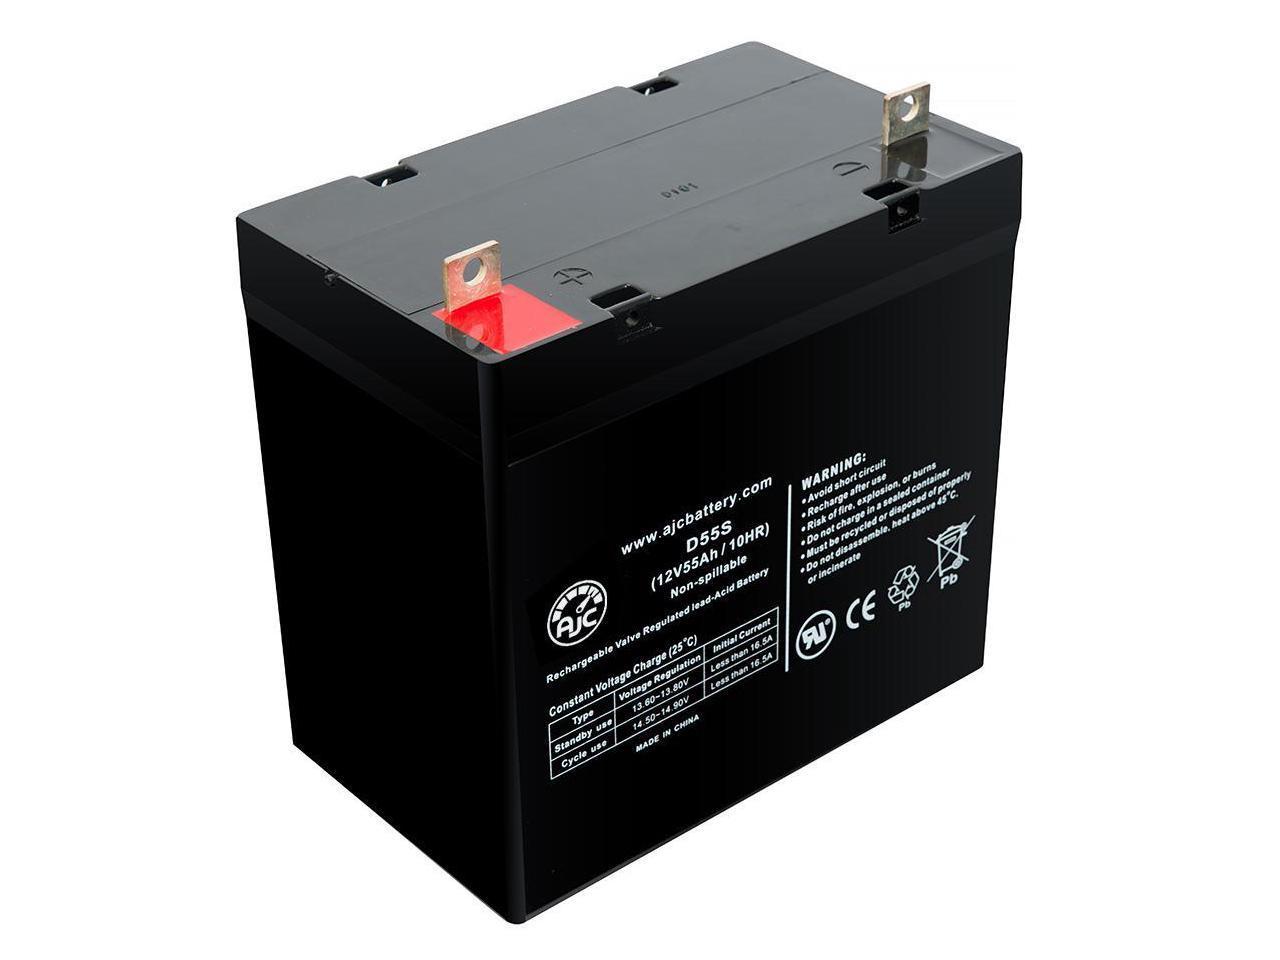 APC Back-UPS ES USB 650VA 12V 9Ah UPS Battery This is an AJC Brand Replacement